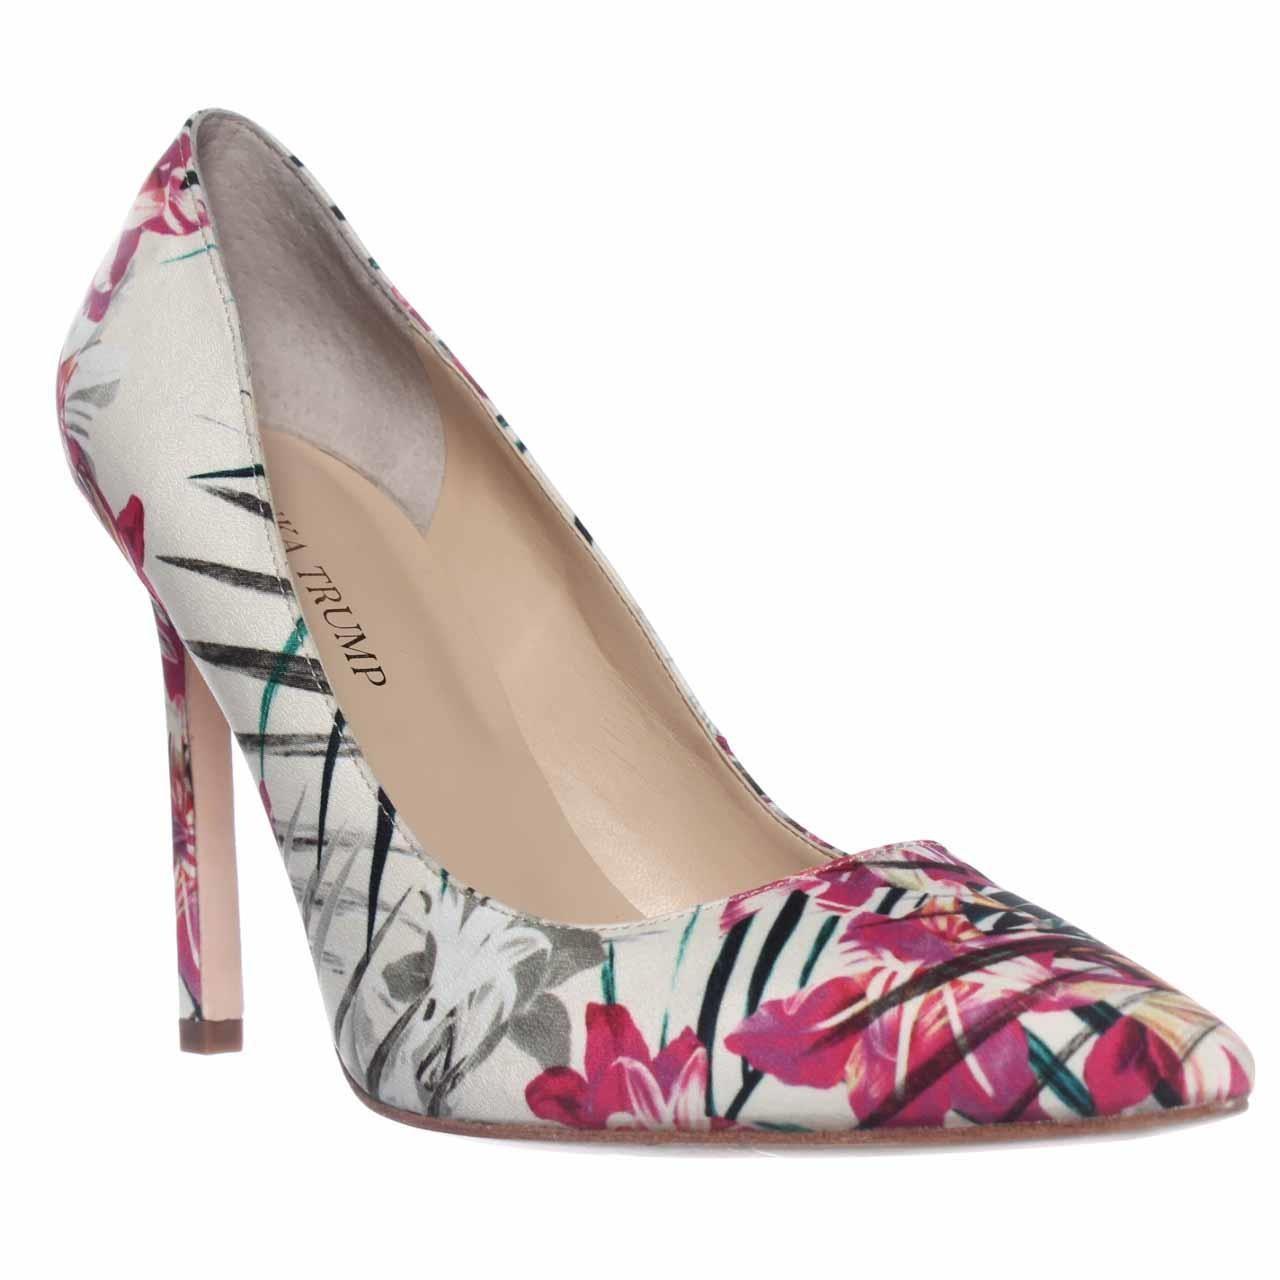 Ivanka trump Carra3 Pointed-toe Classic Pump Heels in Pink | Lyst